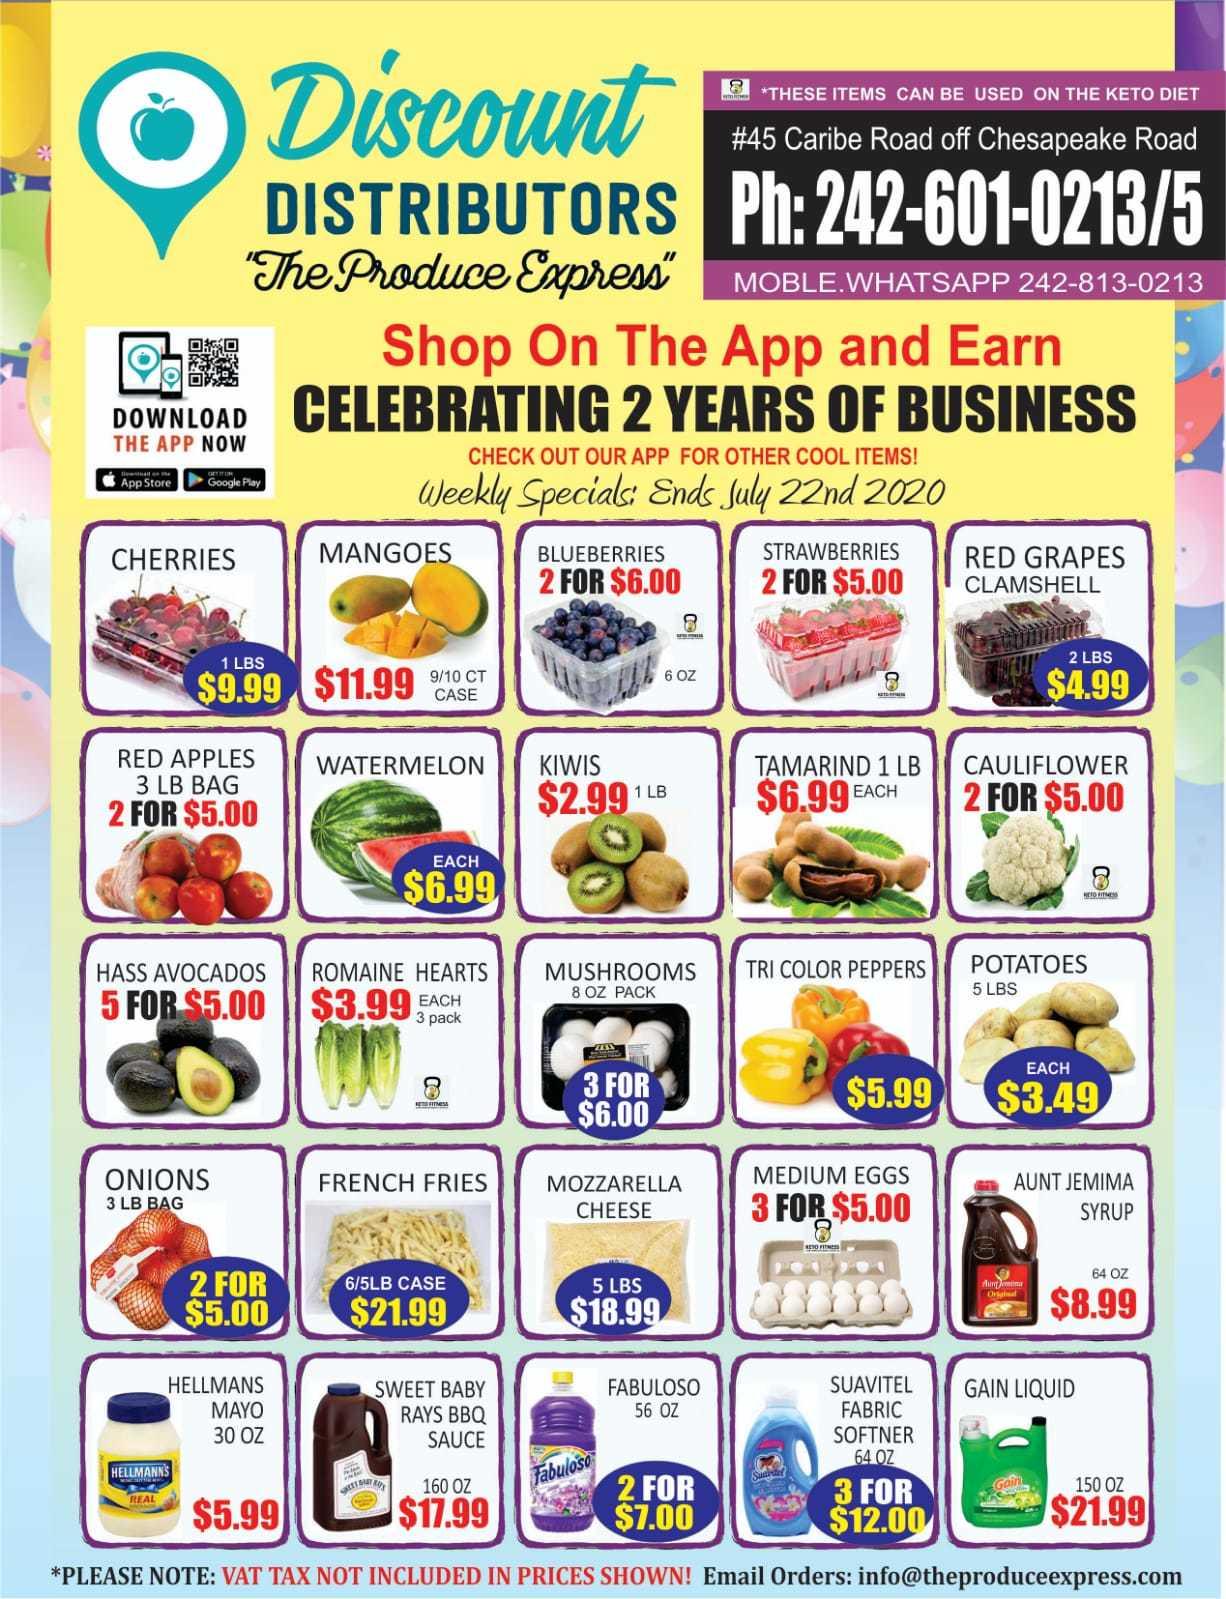 Discount Distributors